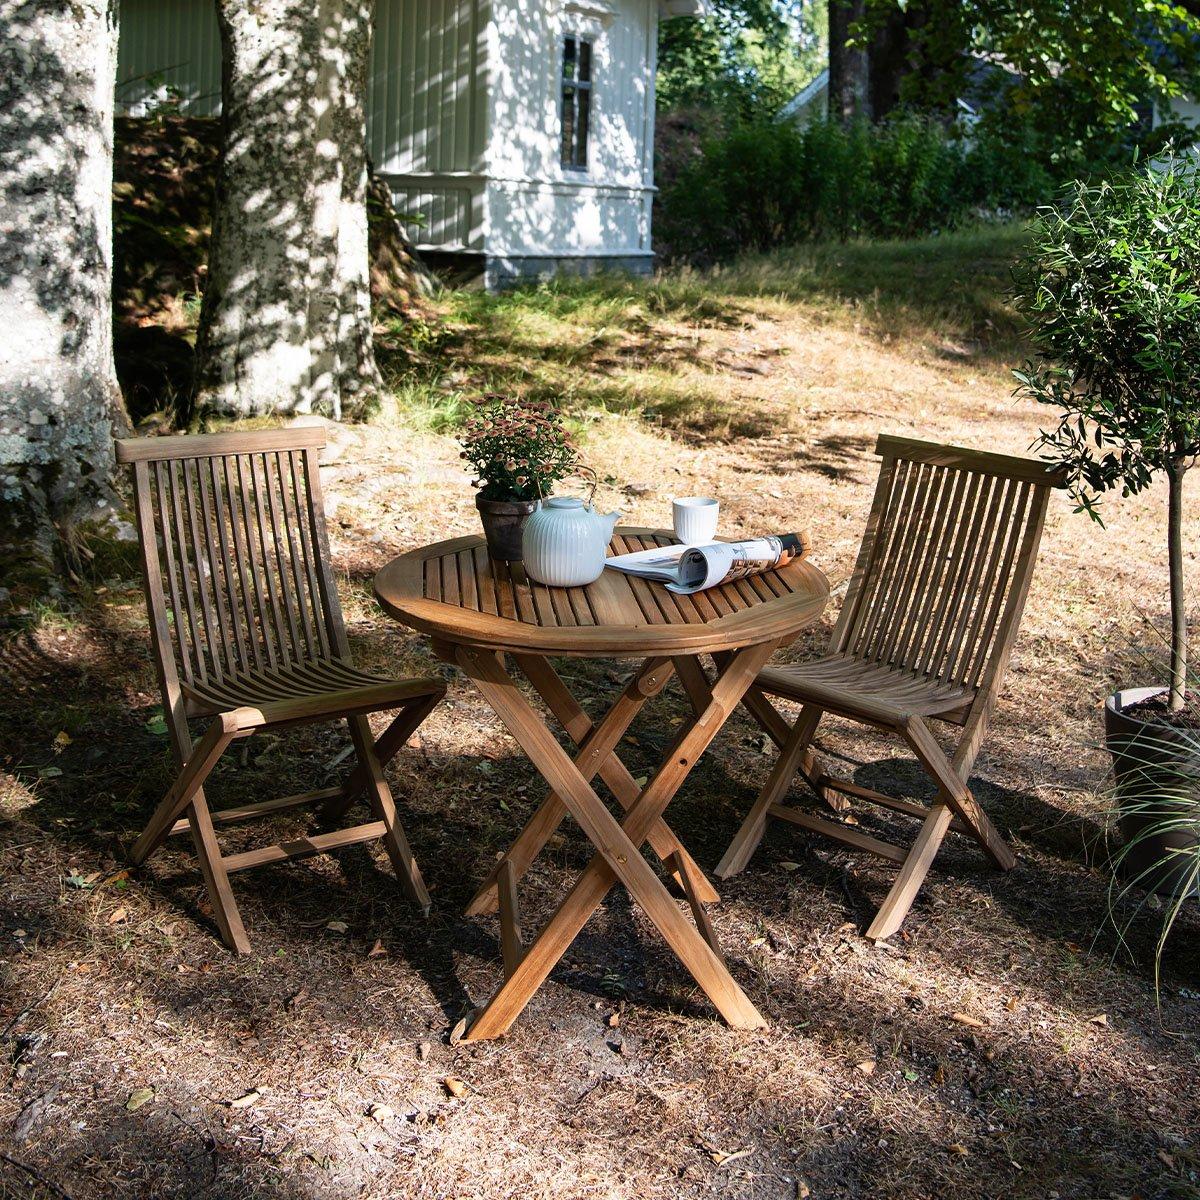 2 klappstoler + bord | Hagemøbler, Teak, Bord